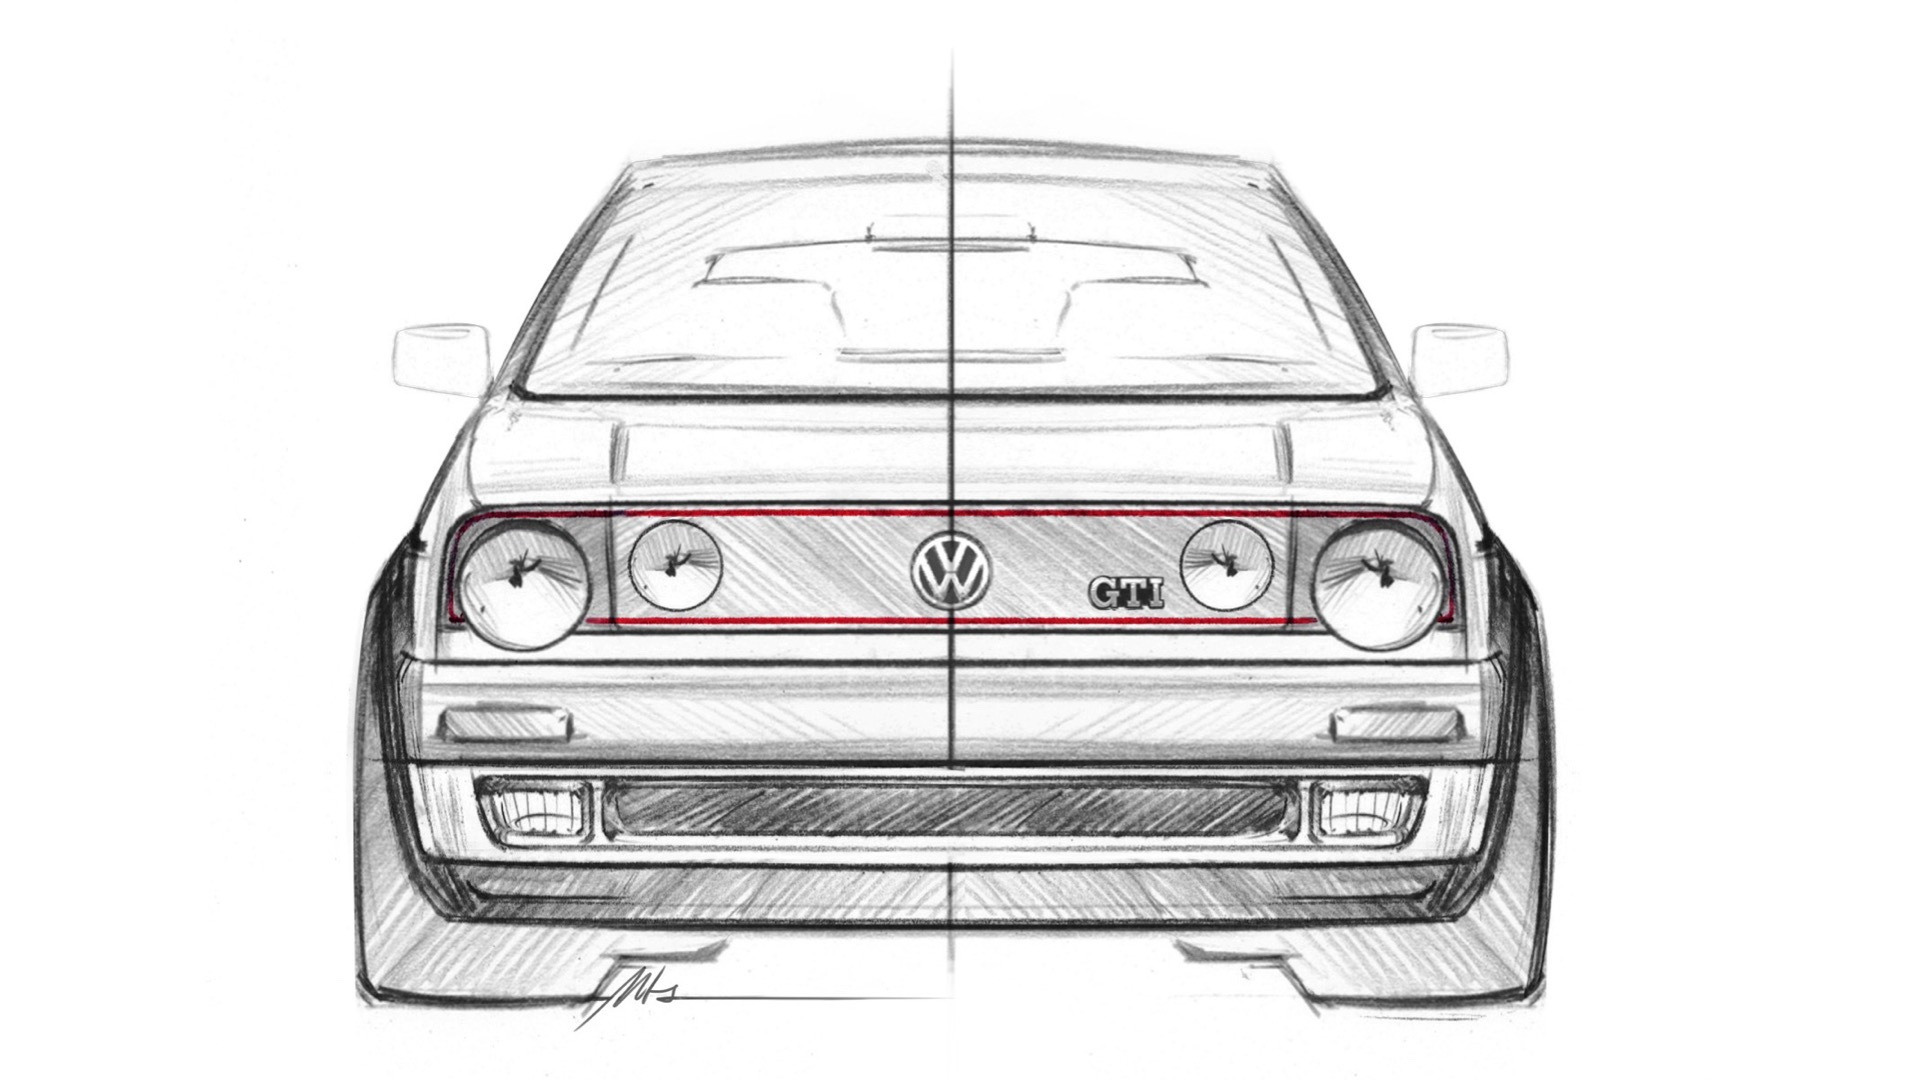 Volkswagen GTI Mk II